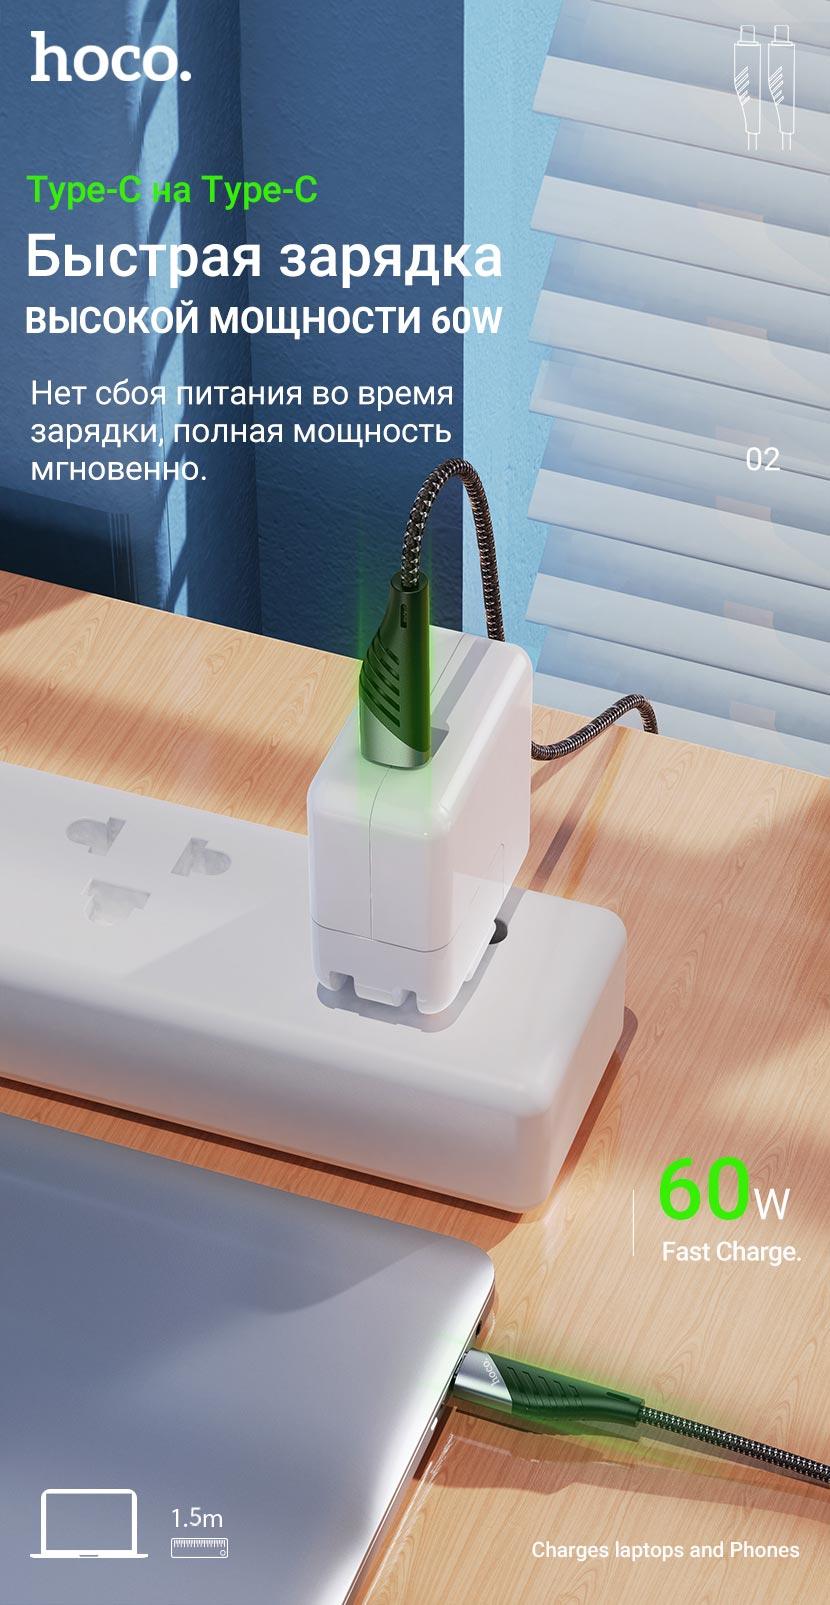 hoco news u95 freeway charging data cable 60w type c to type c ru